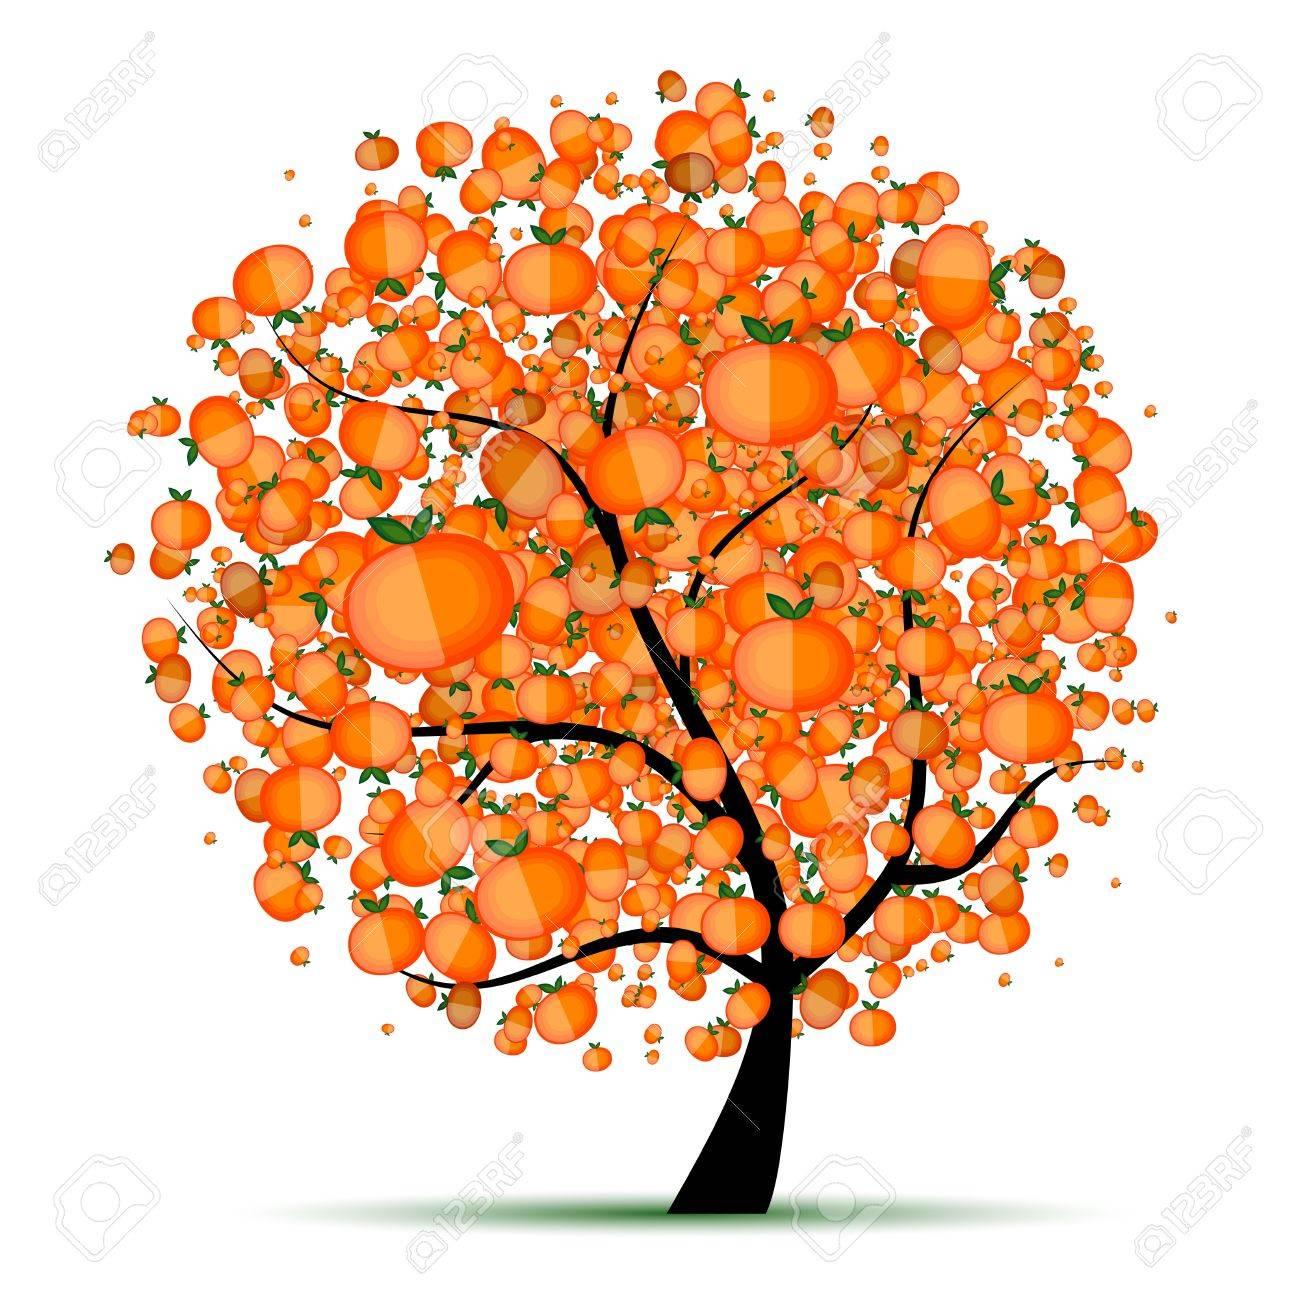 citrus tree images u0026 stock pictures royalty free citrus tree